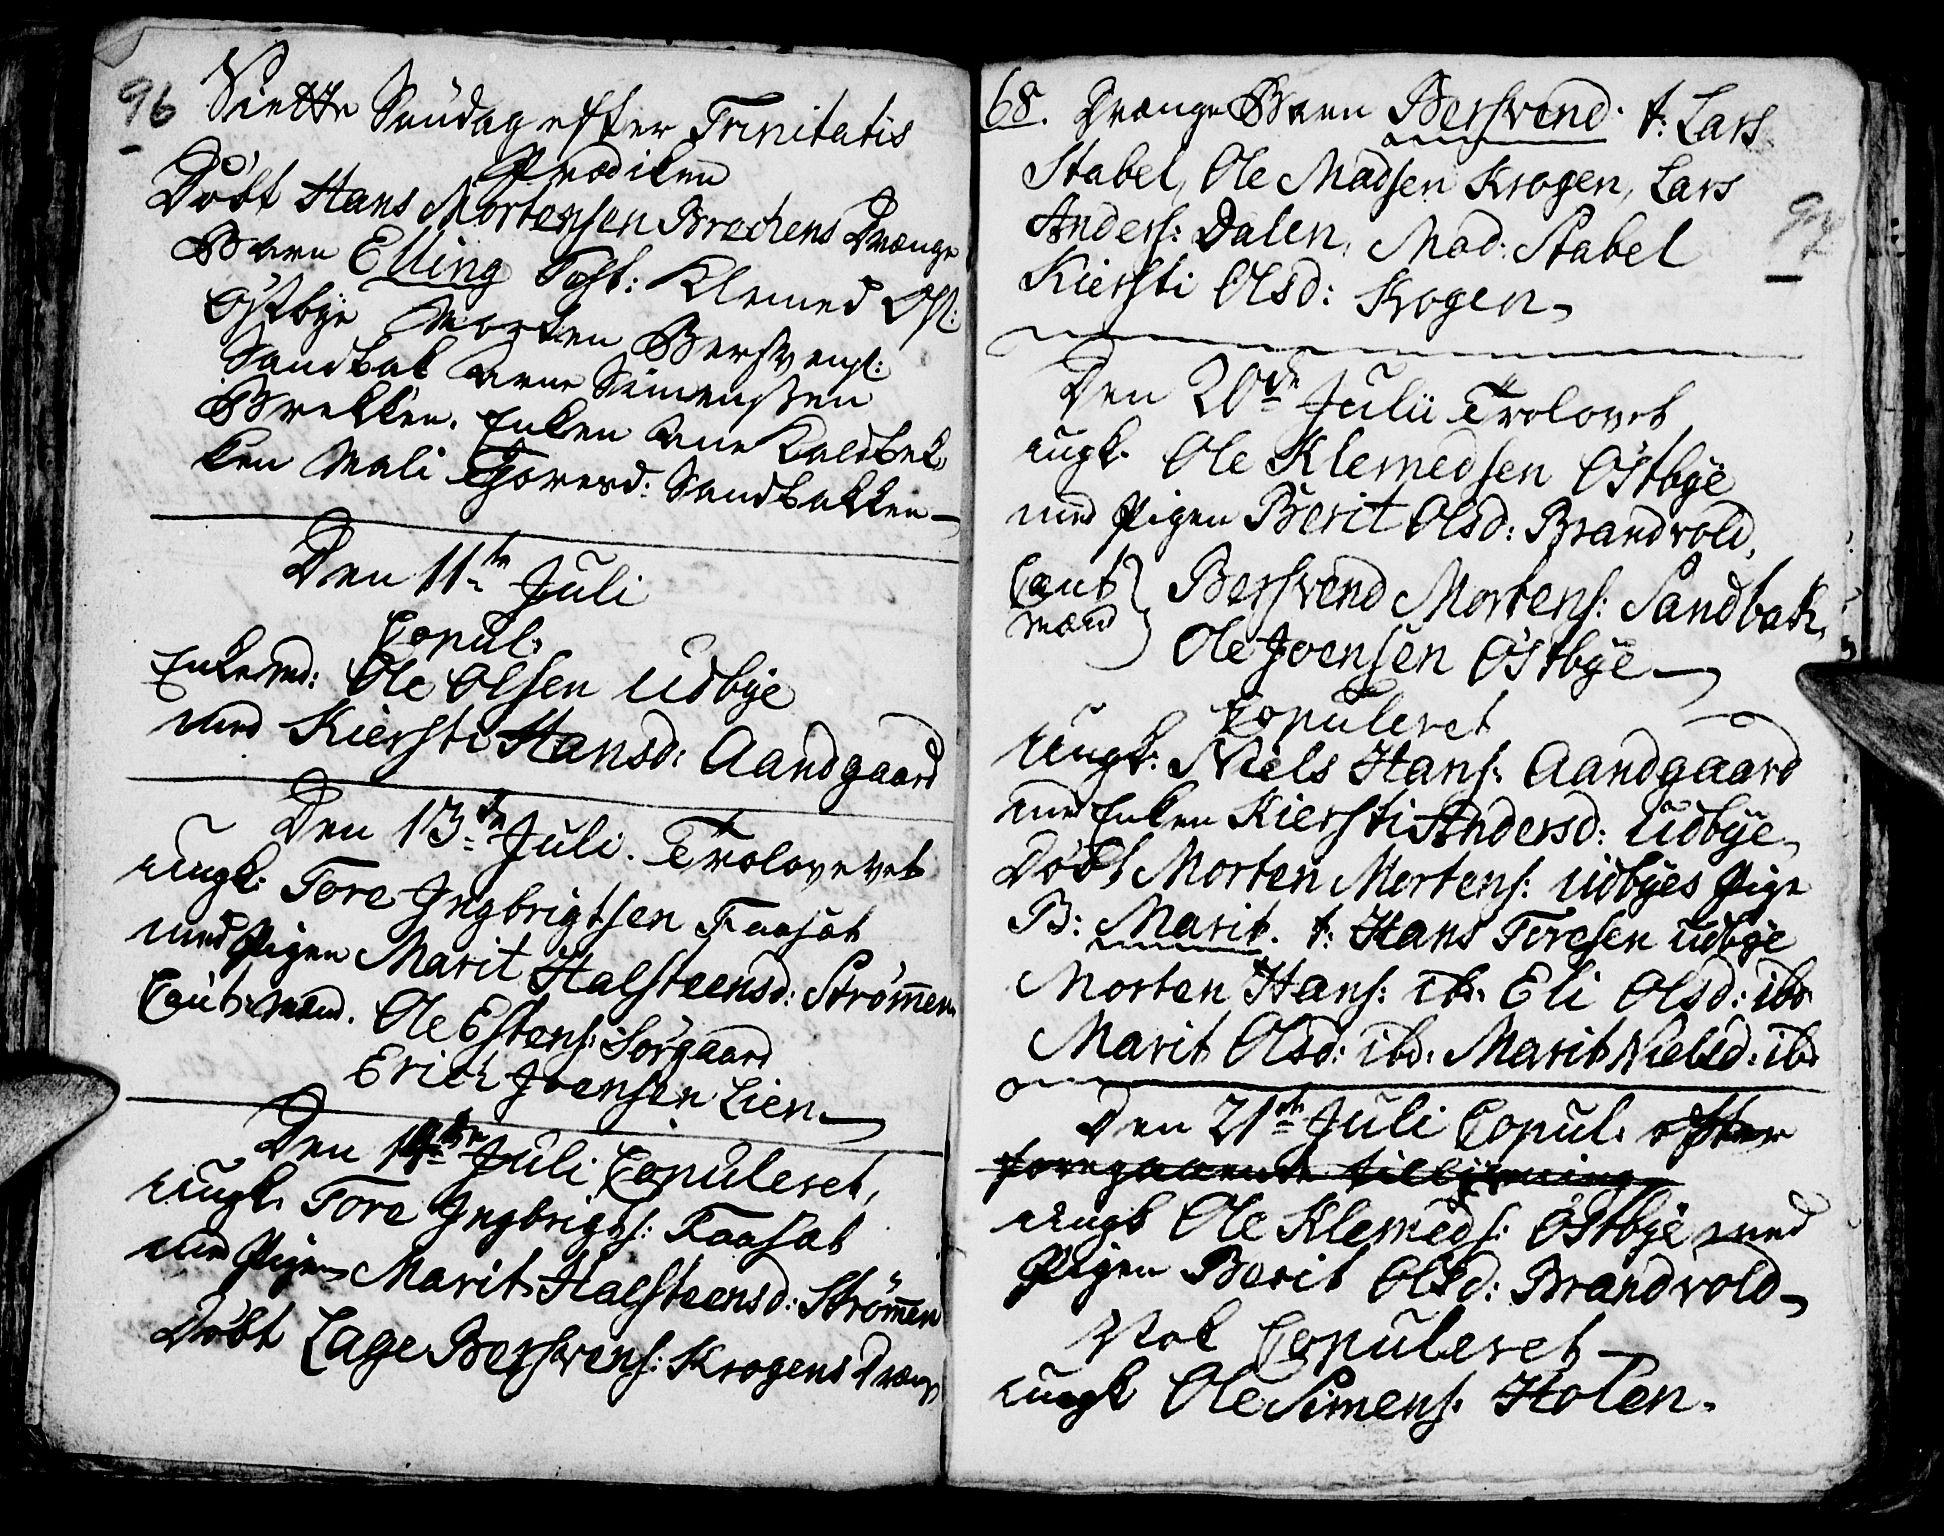 SAH, Tynset prestekontor, Ministerialbok nr. 6, 1763-1779, s. 96-97